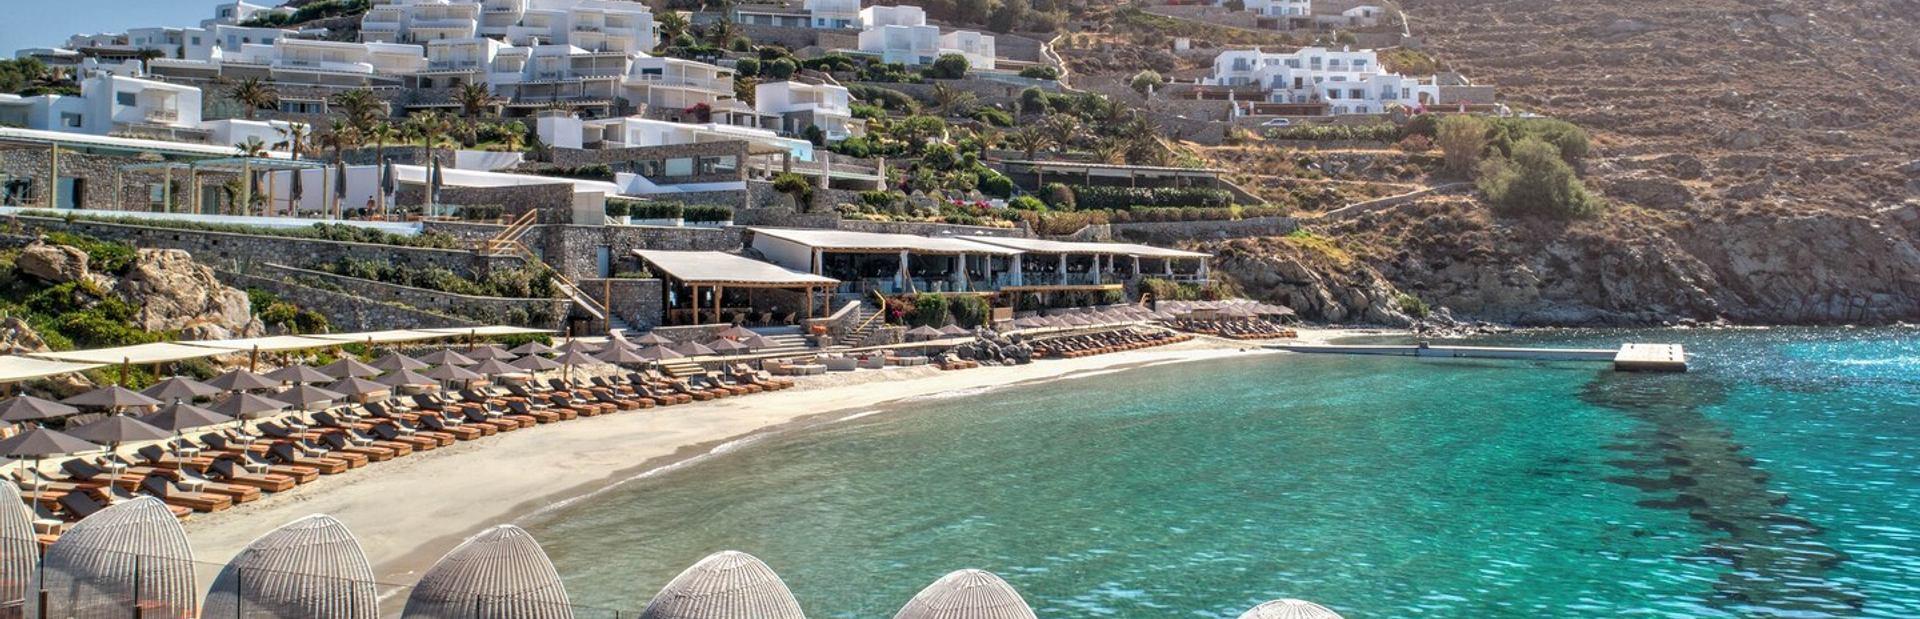 Santa Marina Image 1